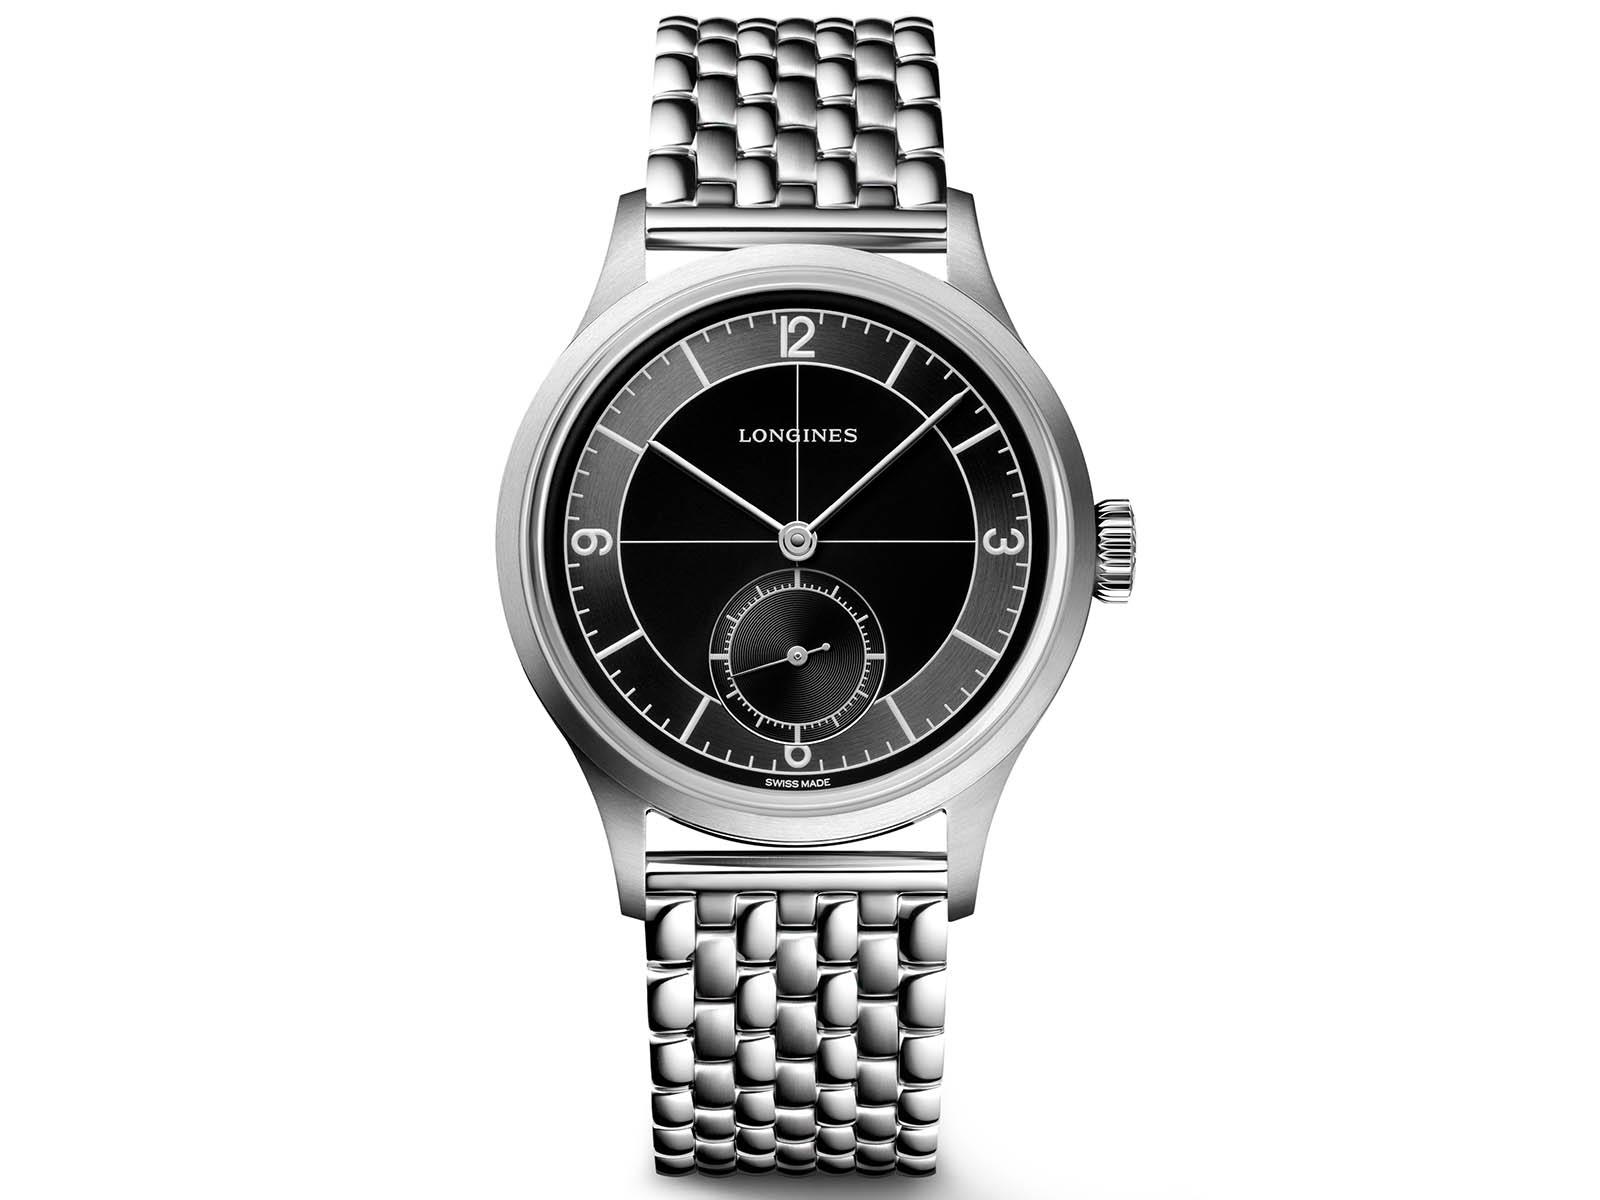 l2-828-4-53-6-longines-heritage-classic-black-dial-5.jpg